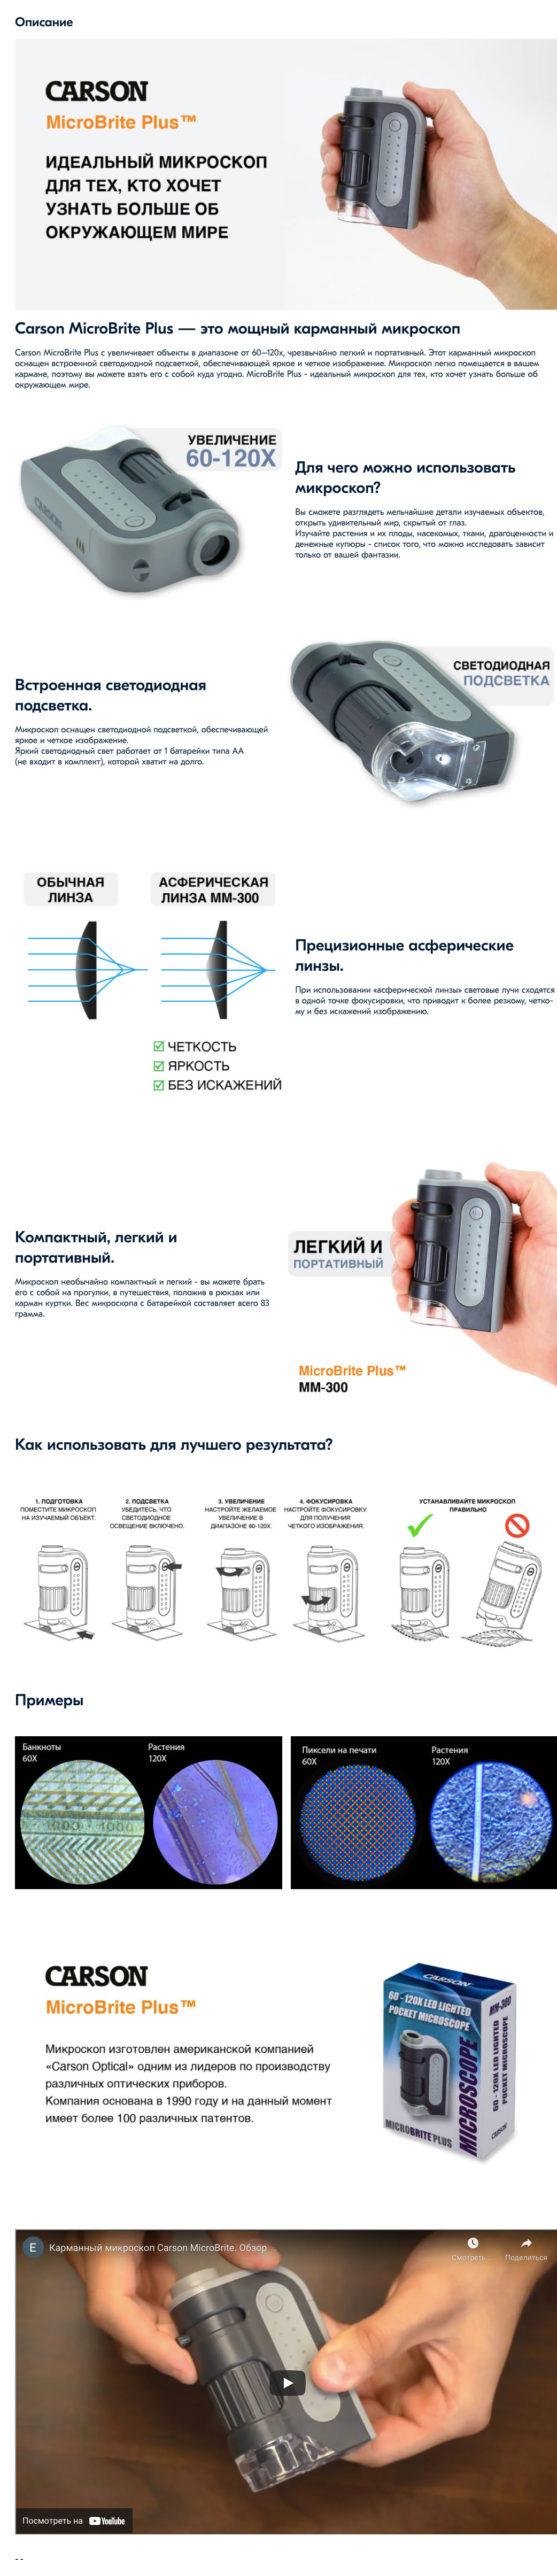 screencapture-ozon-ru-product-mikroskop